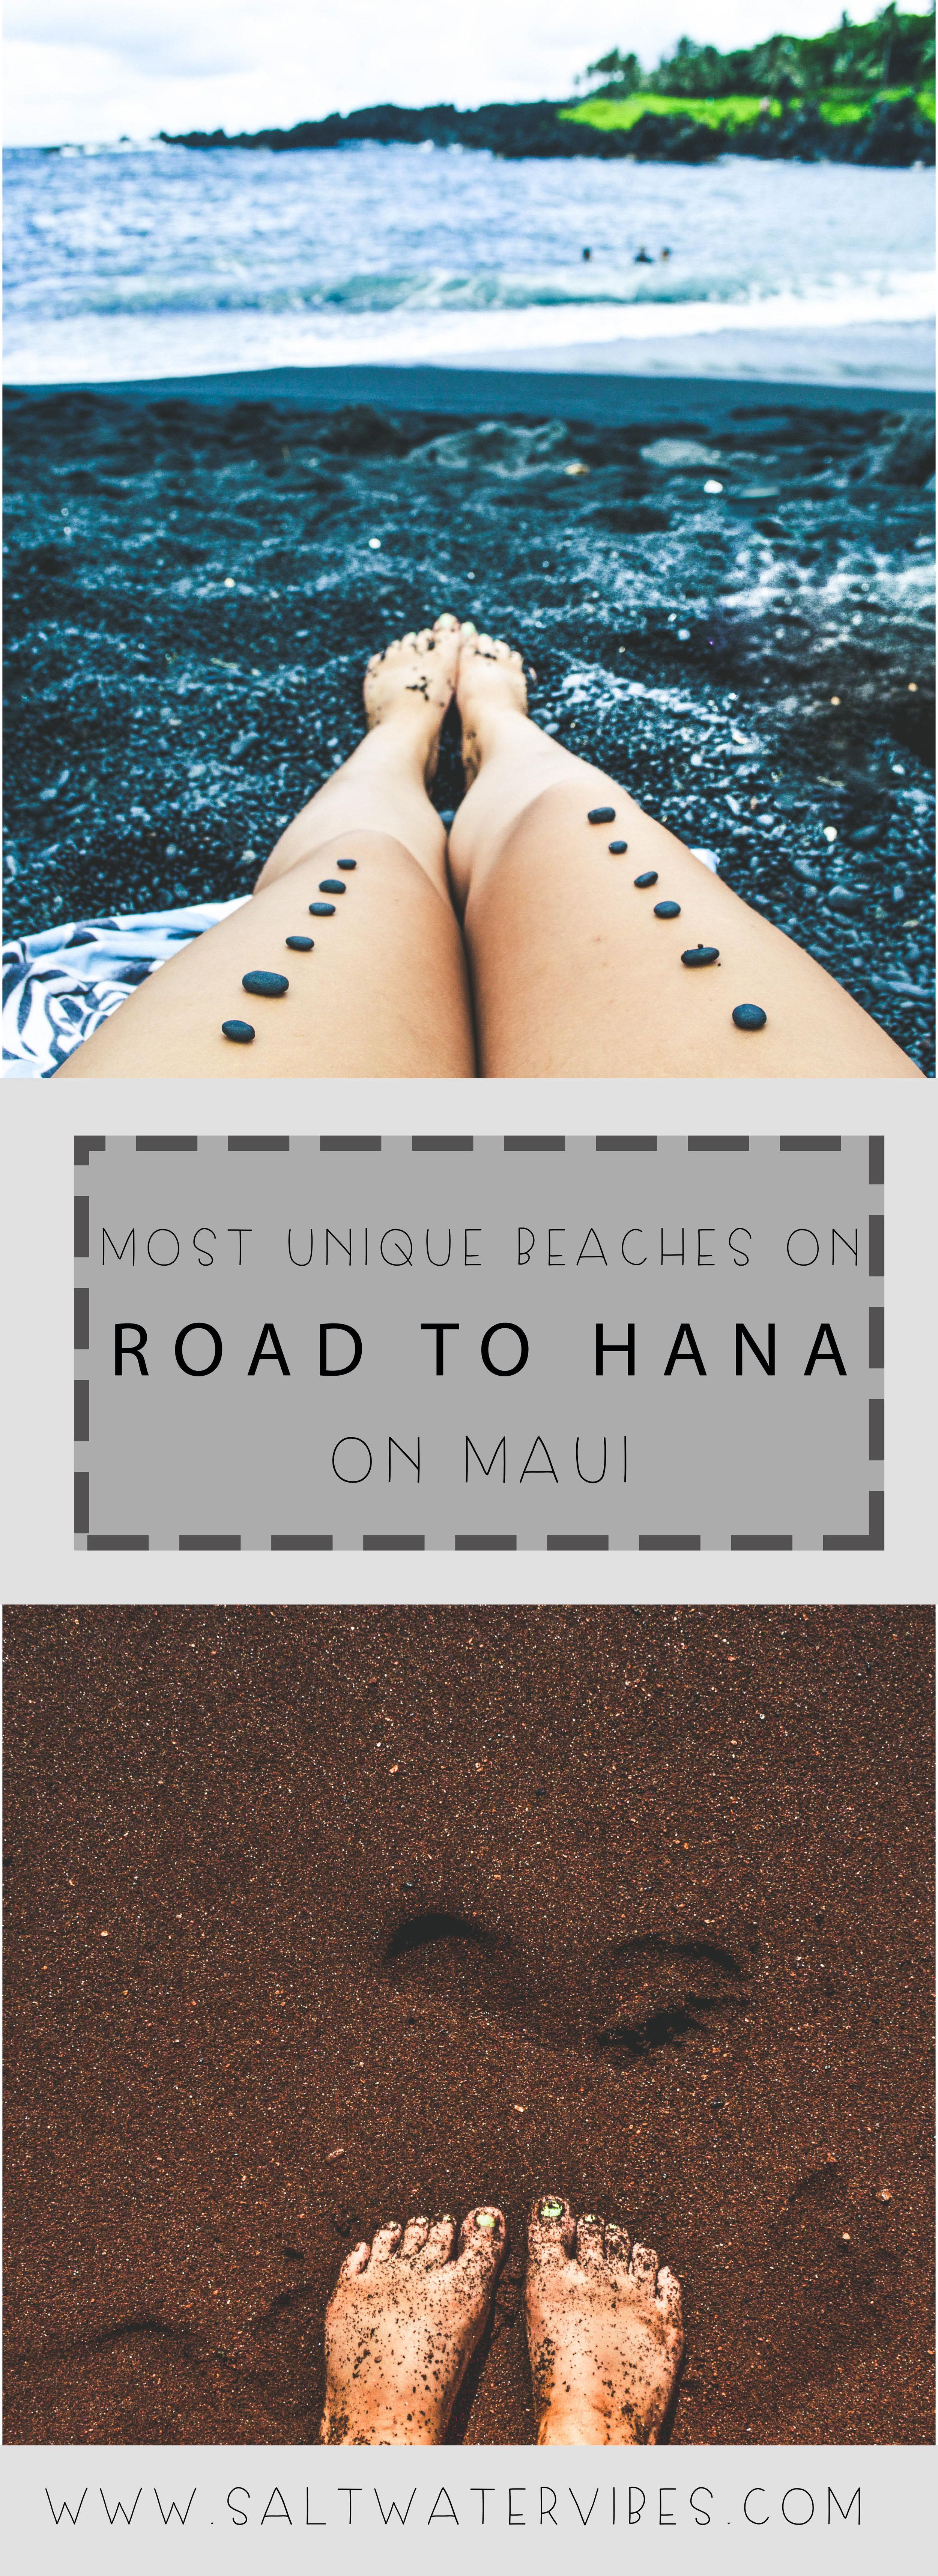 Road To Hana + SaltWaterVibes